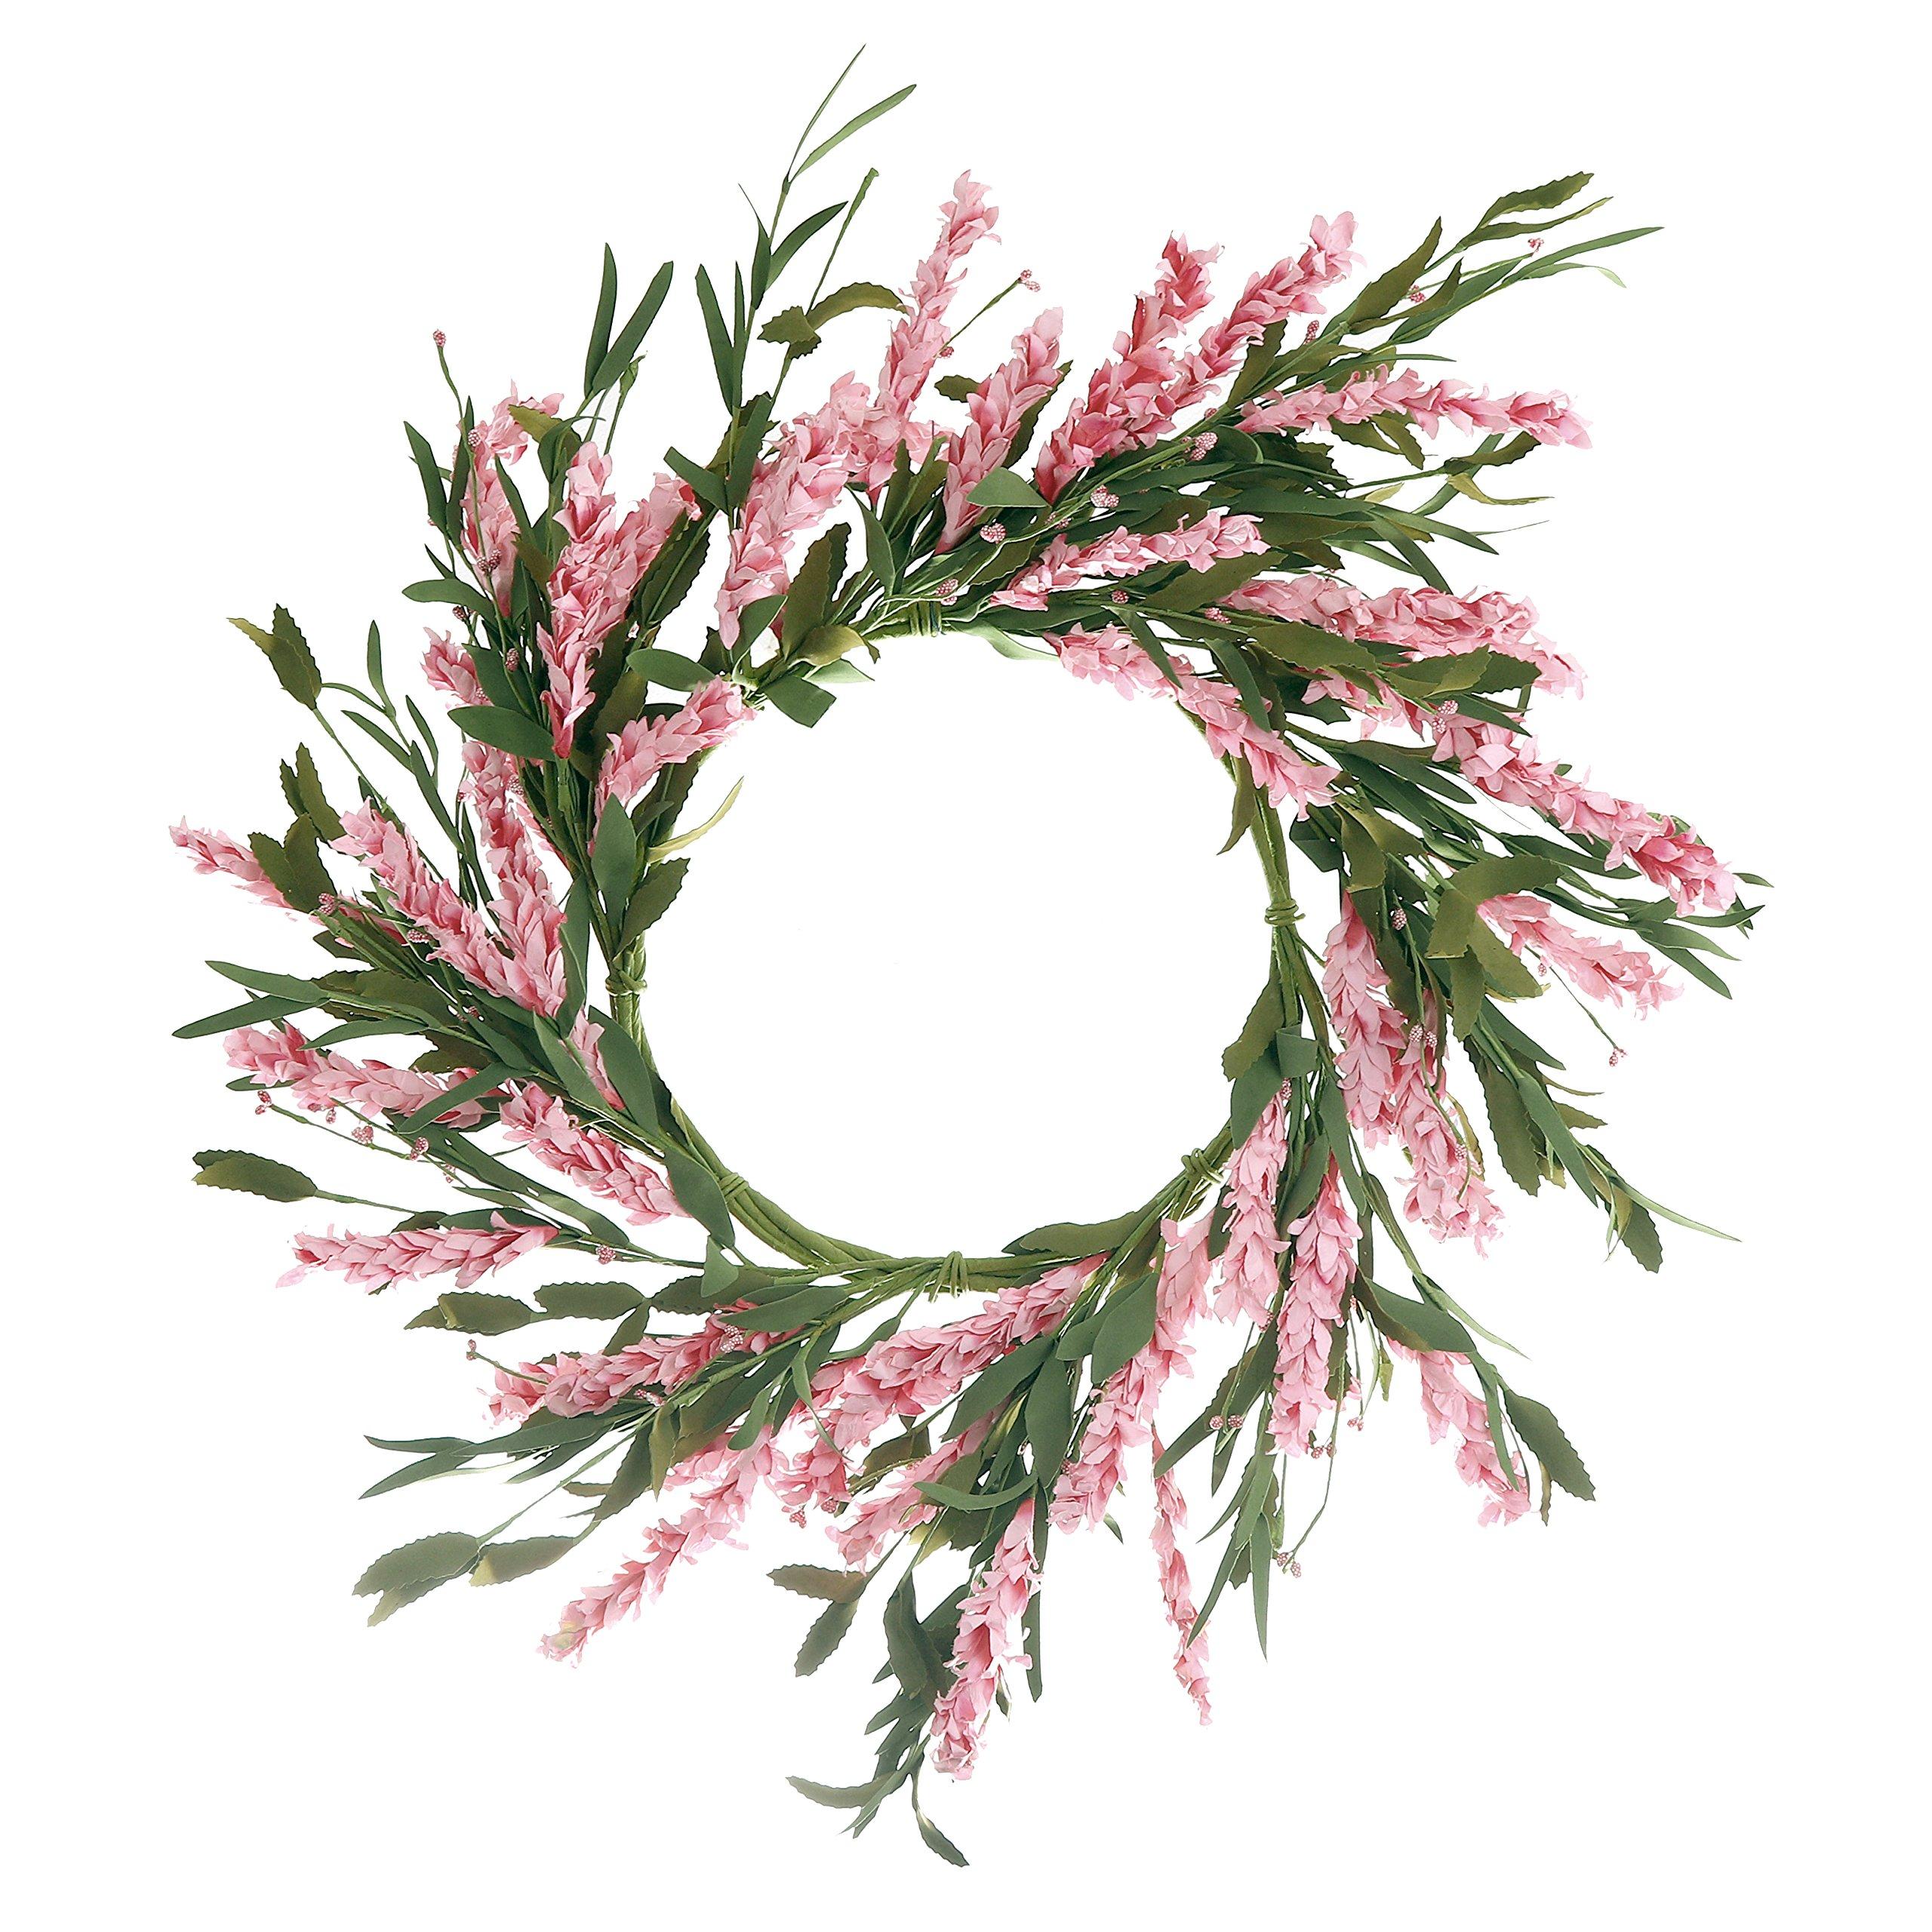 Qinbei Rina Front Door Wreath,19 Inch Artificial Handcrafted Flower with Twig Based,Indoor Front Door Wall House Office Garden Wedding Spring Summer Decoration, Hot Pink Flowers